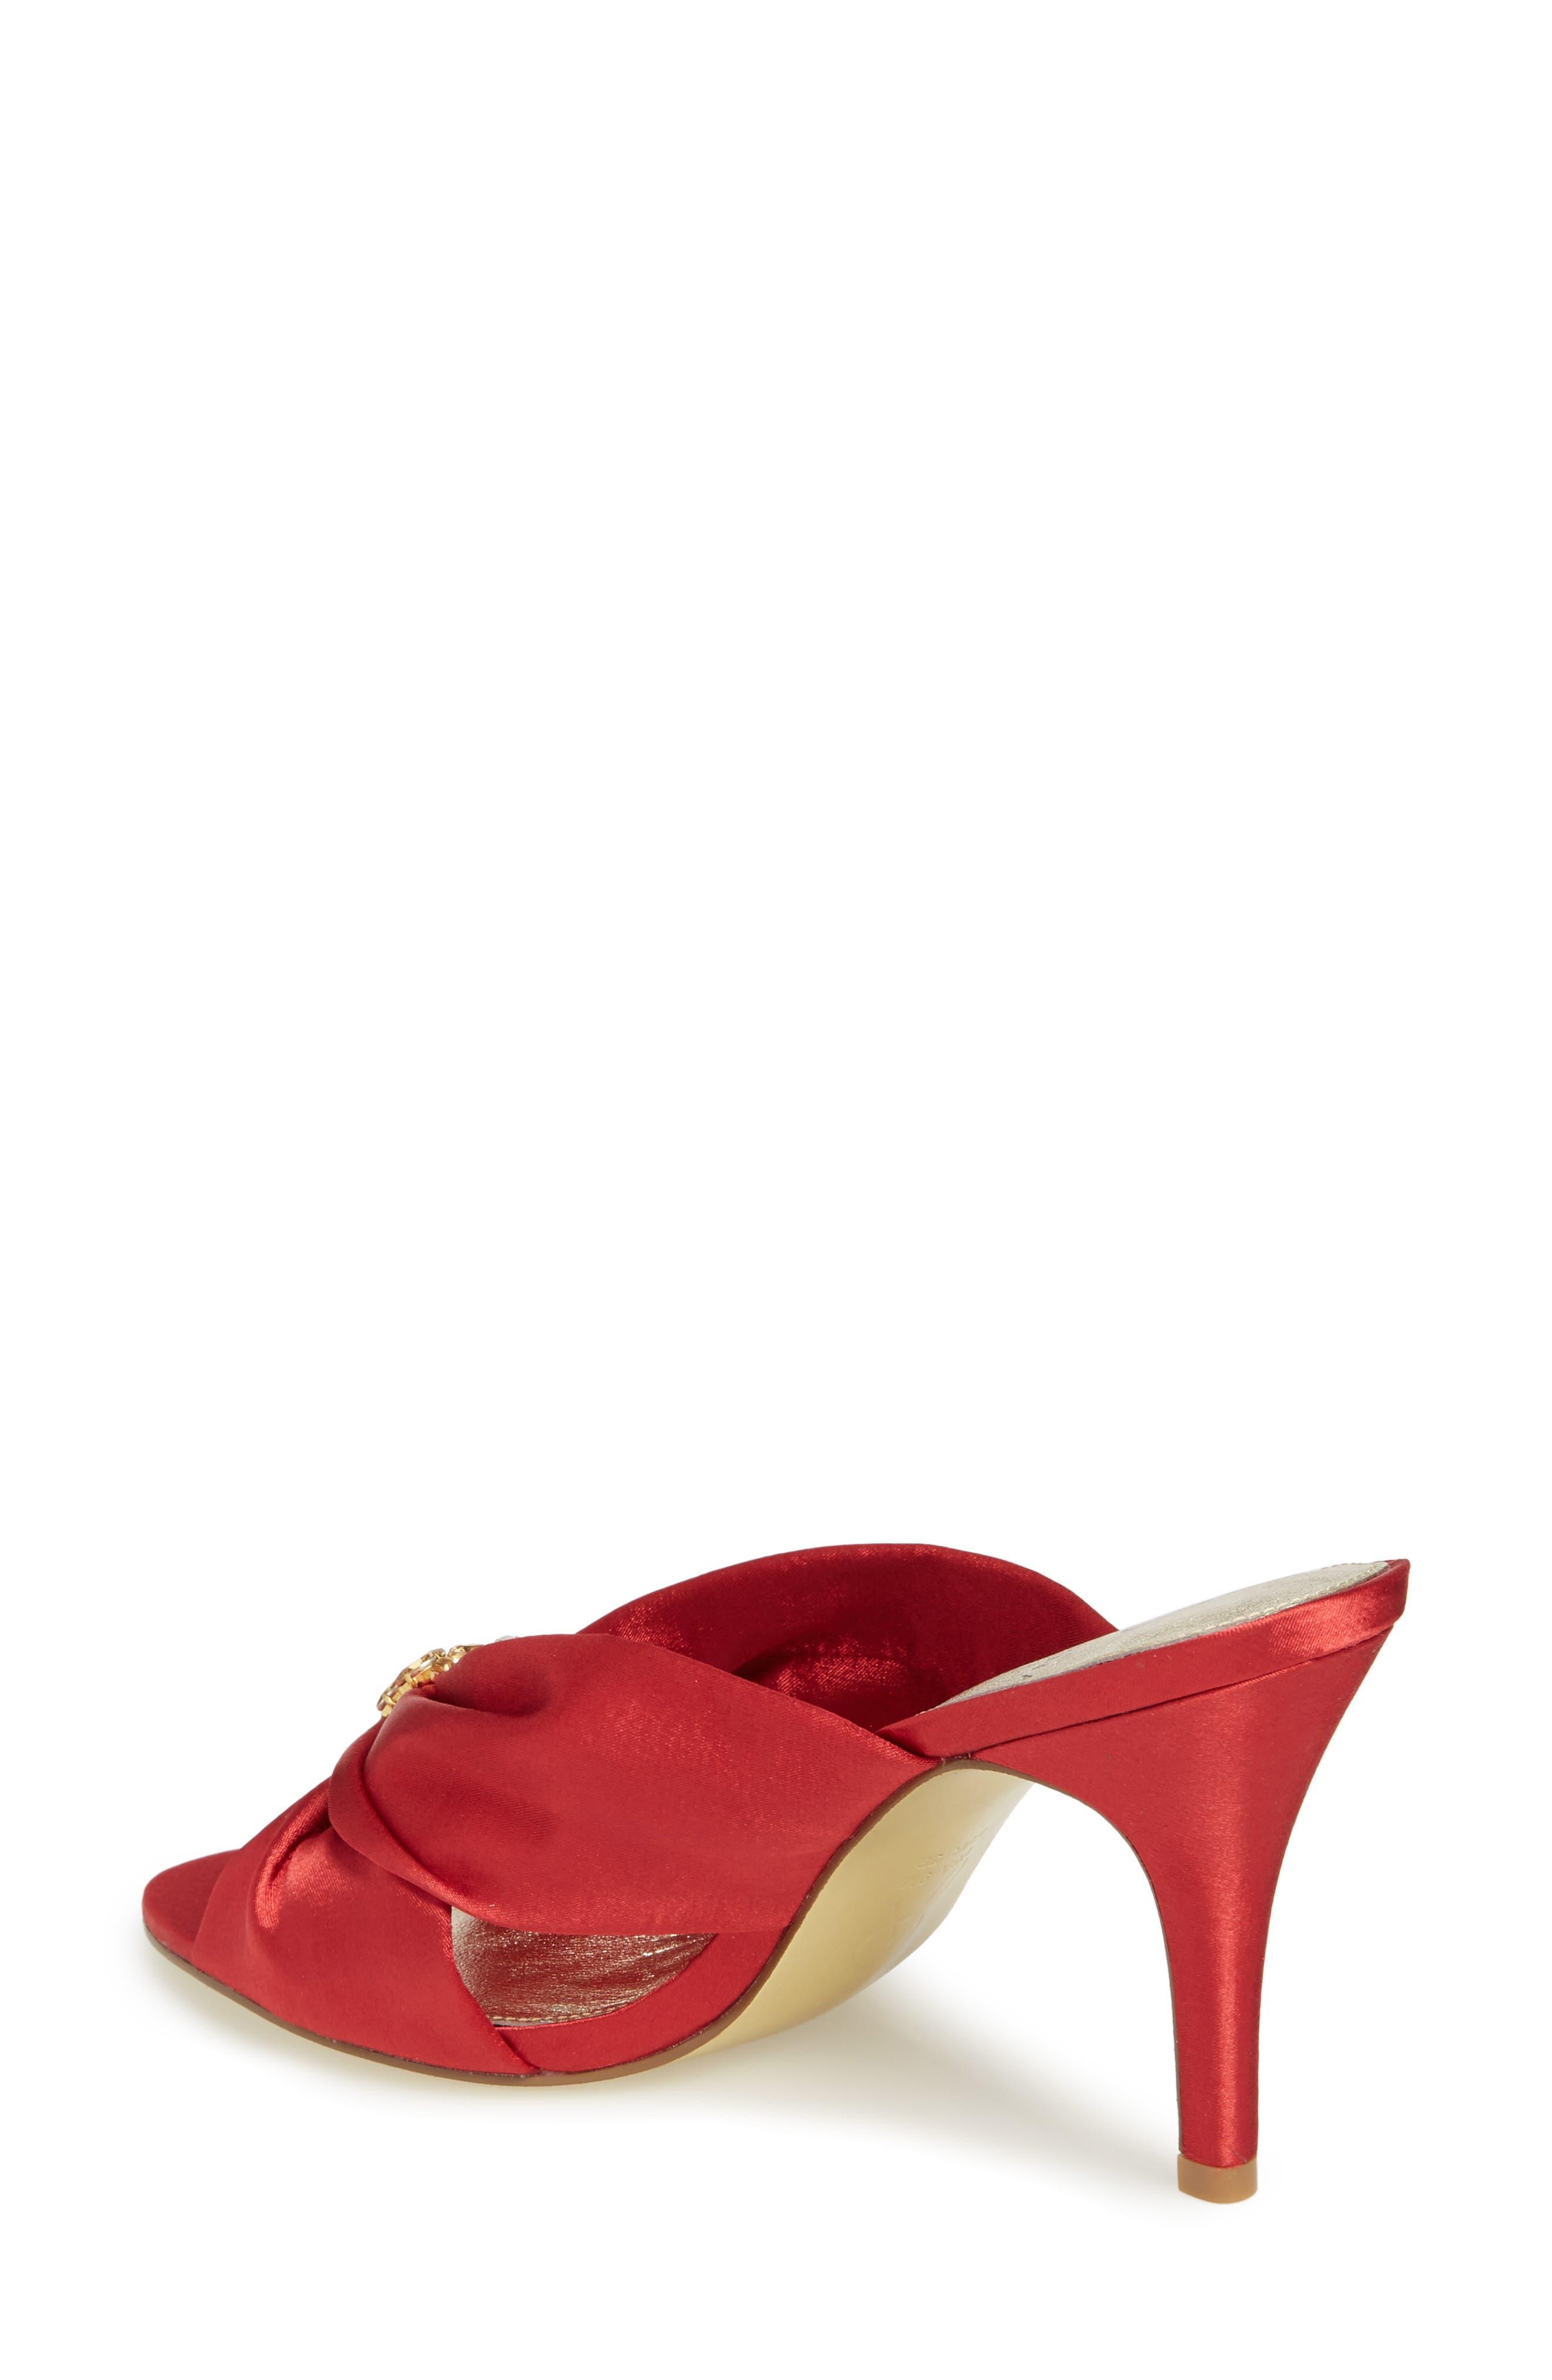 Flo Sandal,                             Alternate thumbnail 2, color,                             Red Satin